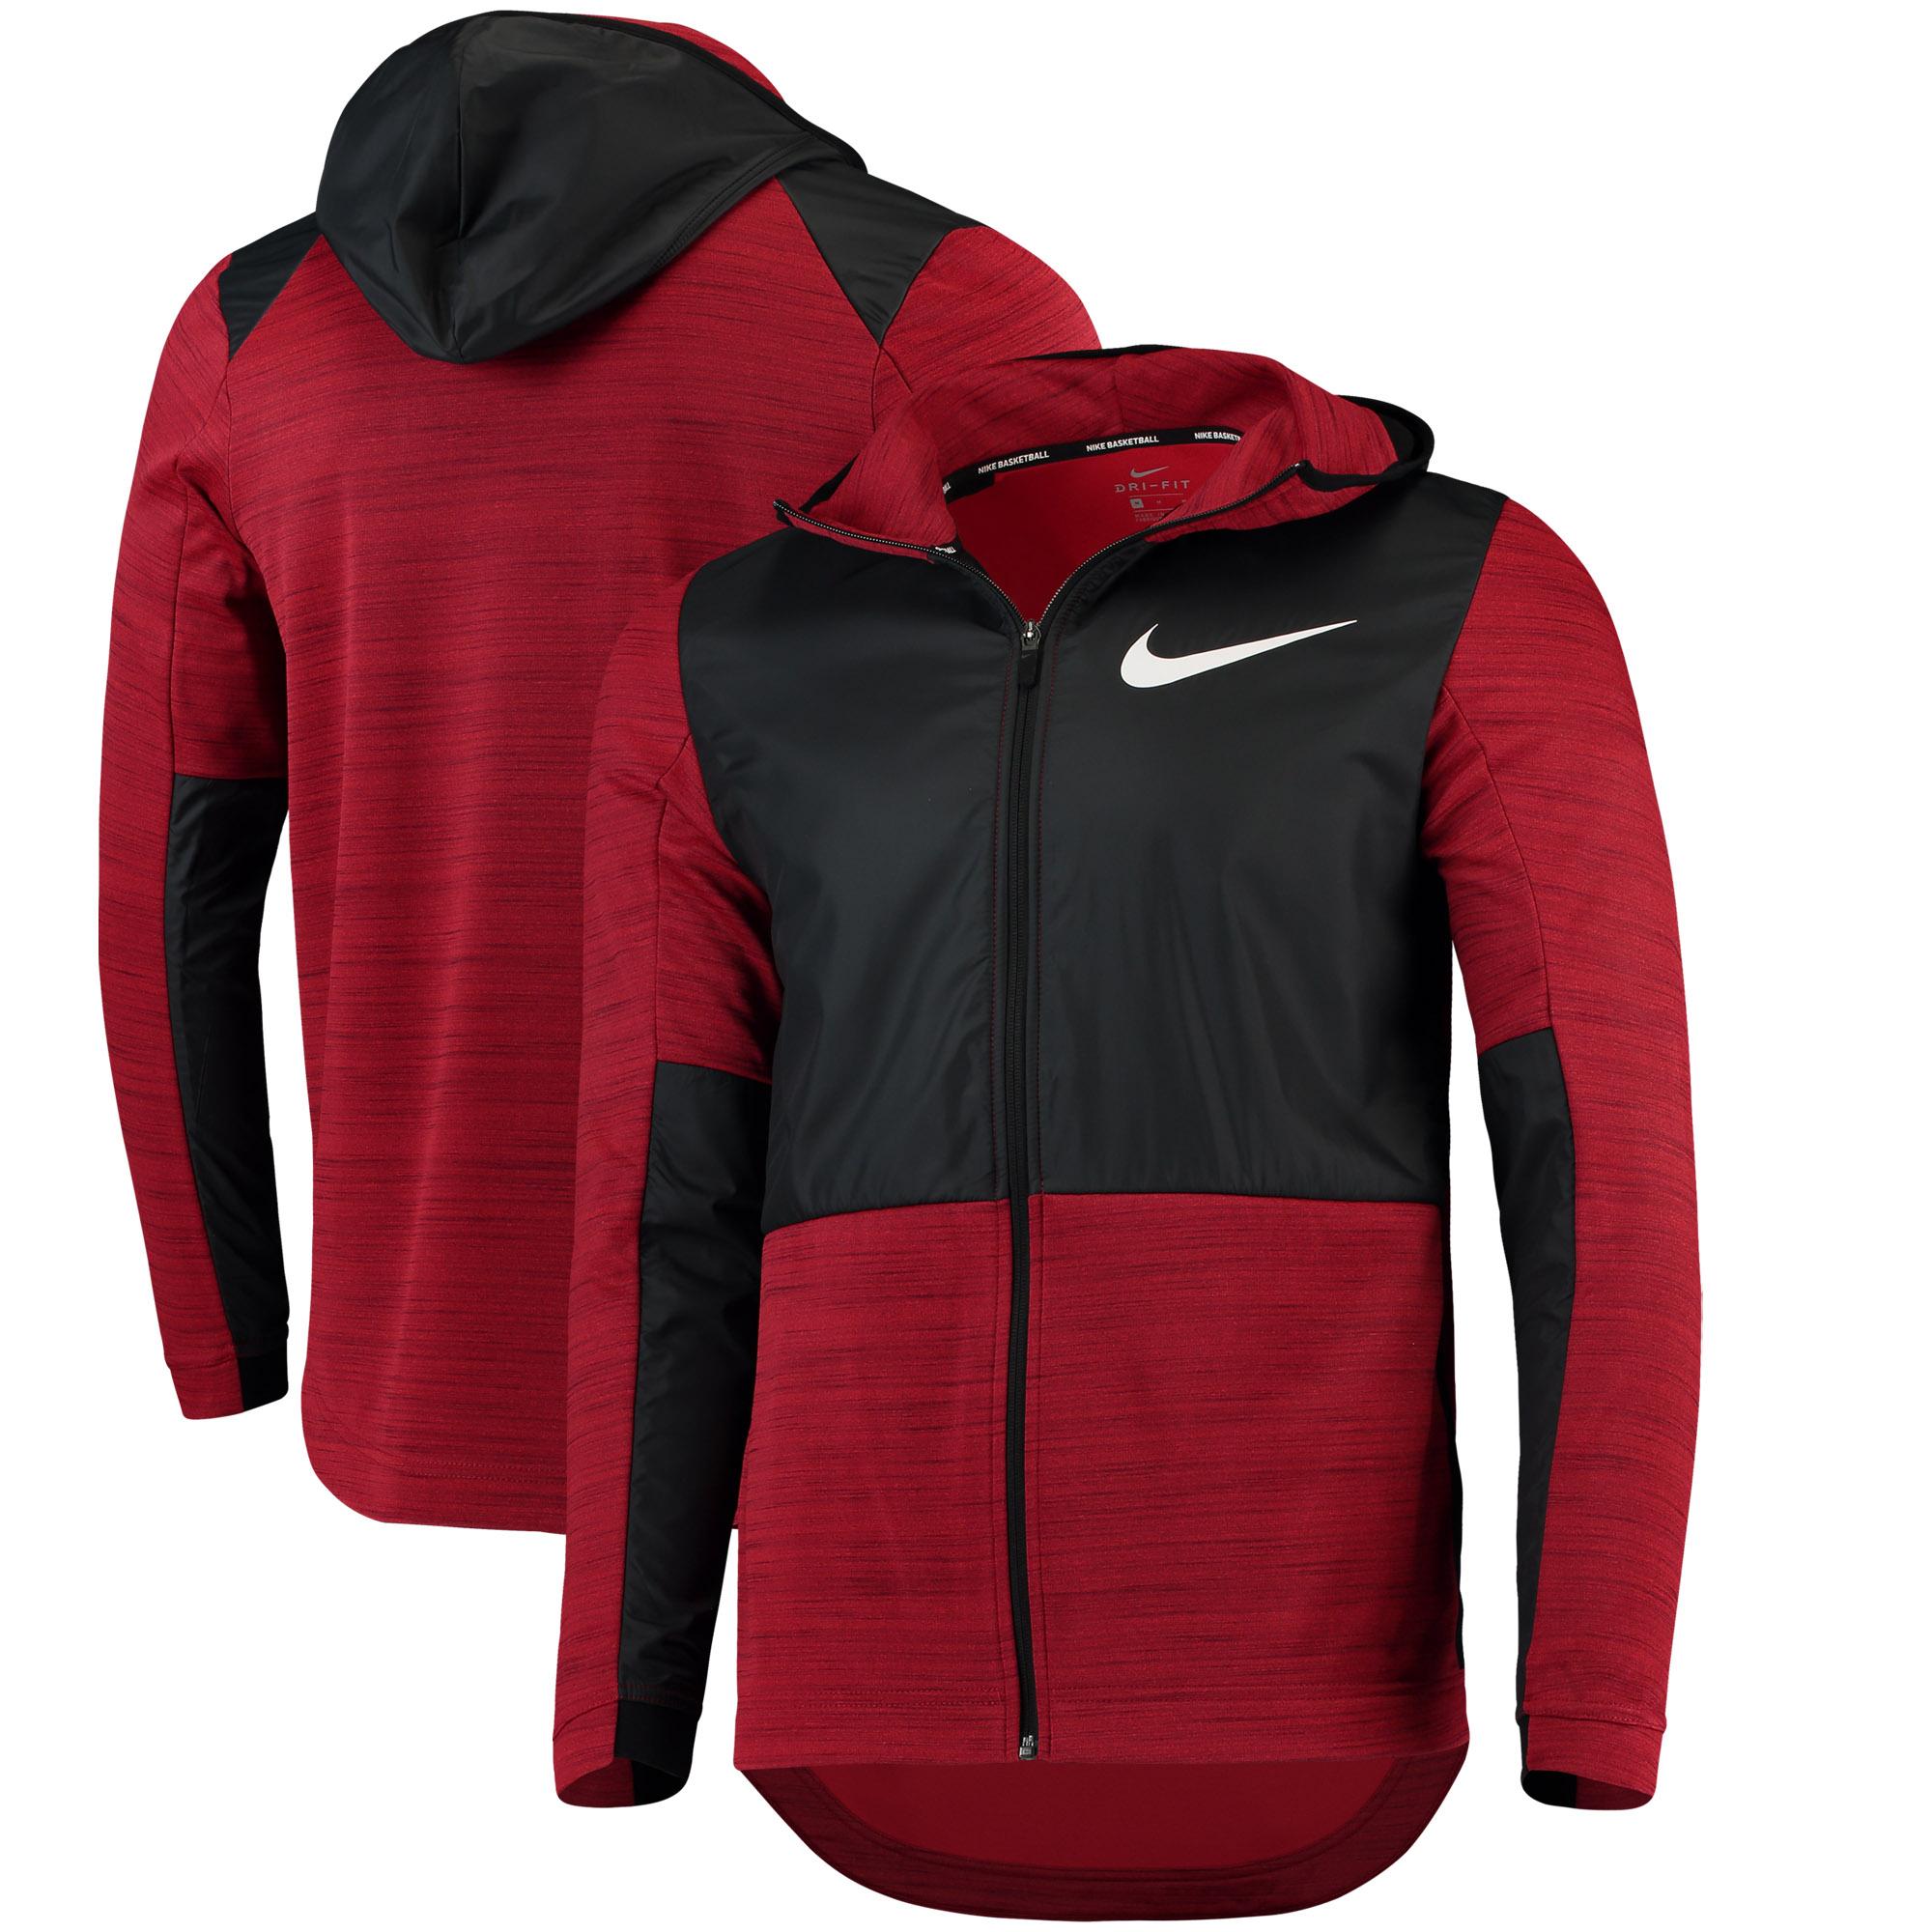 NBA Nike Basketball Performance Full-Zip Hoodie - Red/Black